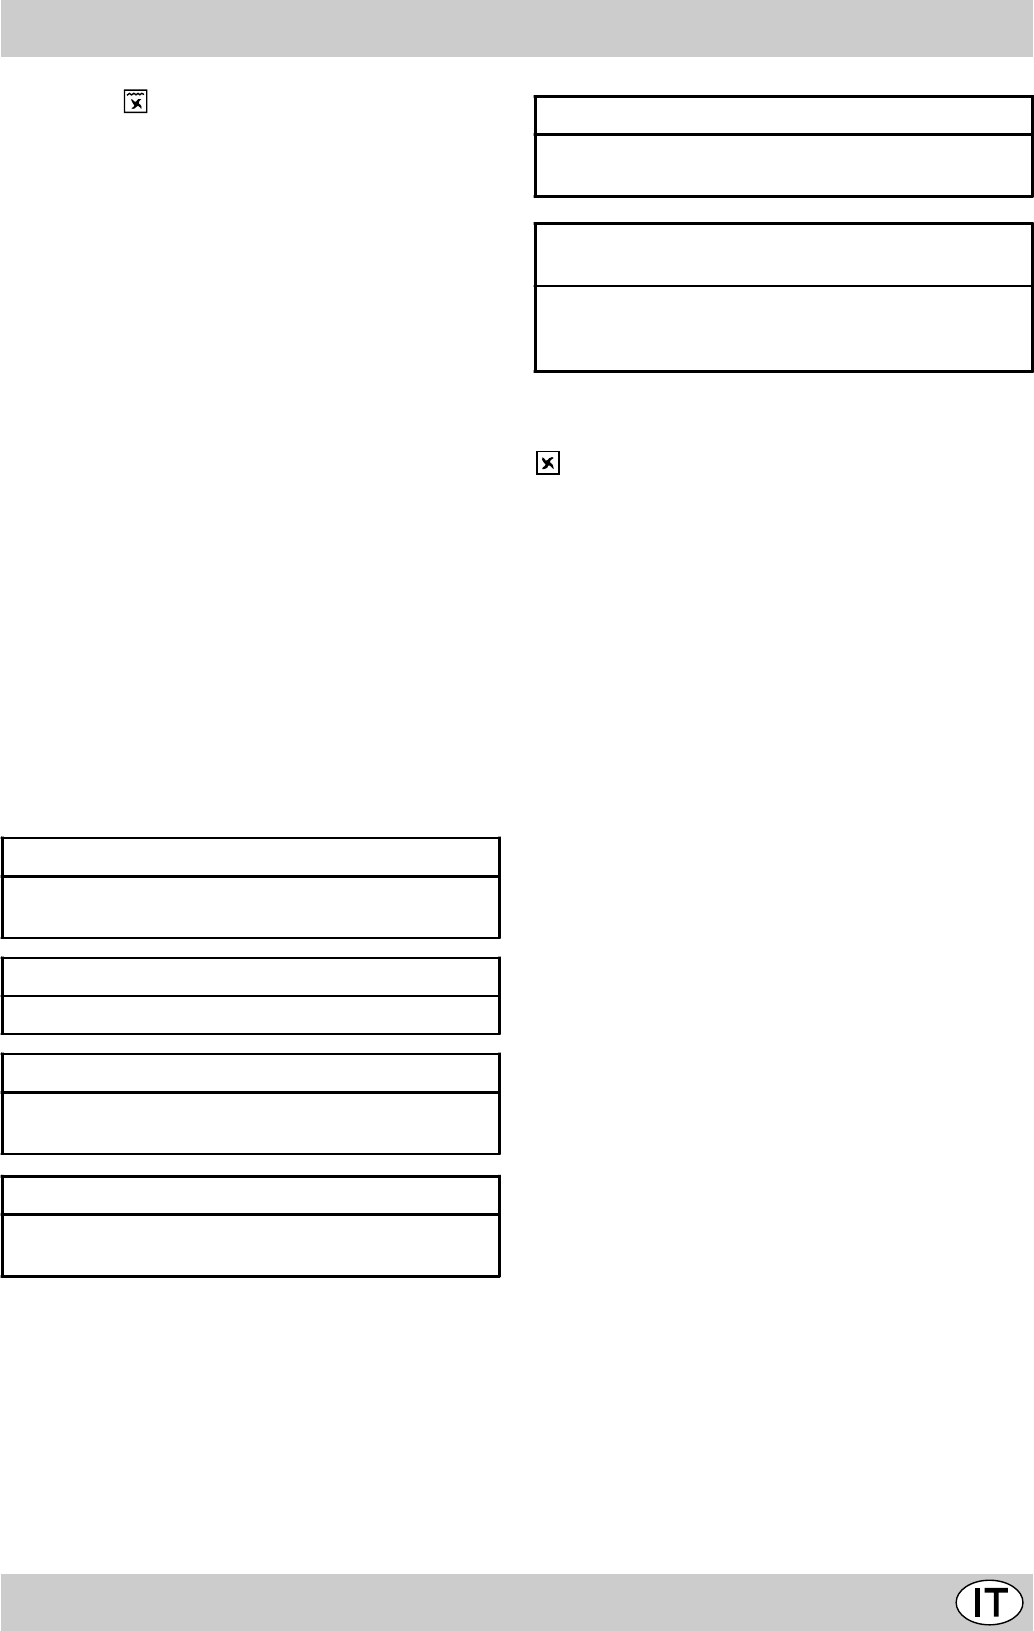 Handleiding Ariston Fm 54 T Pagina 25 Van 42 English Espan L  # Muebles Plasticos Riduco